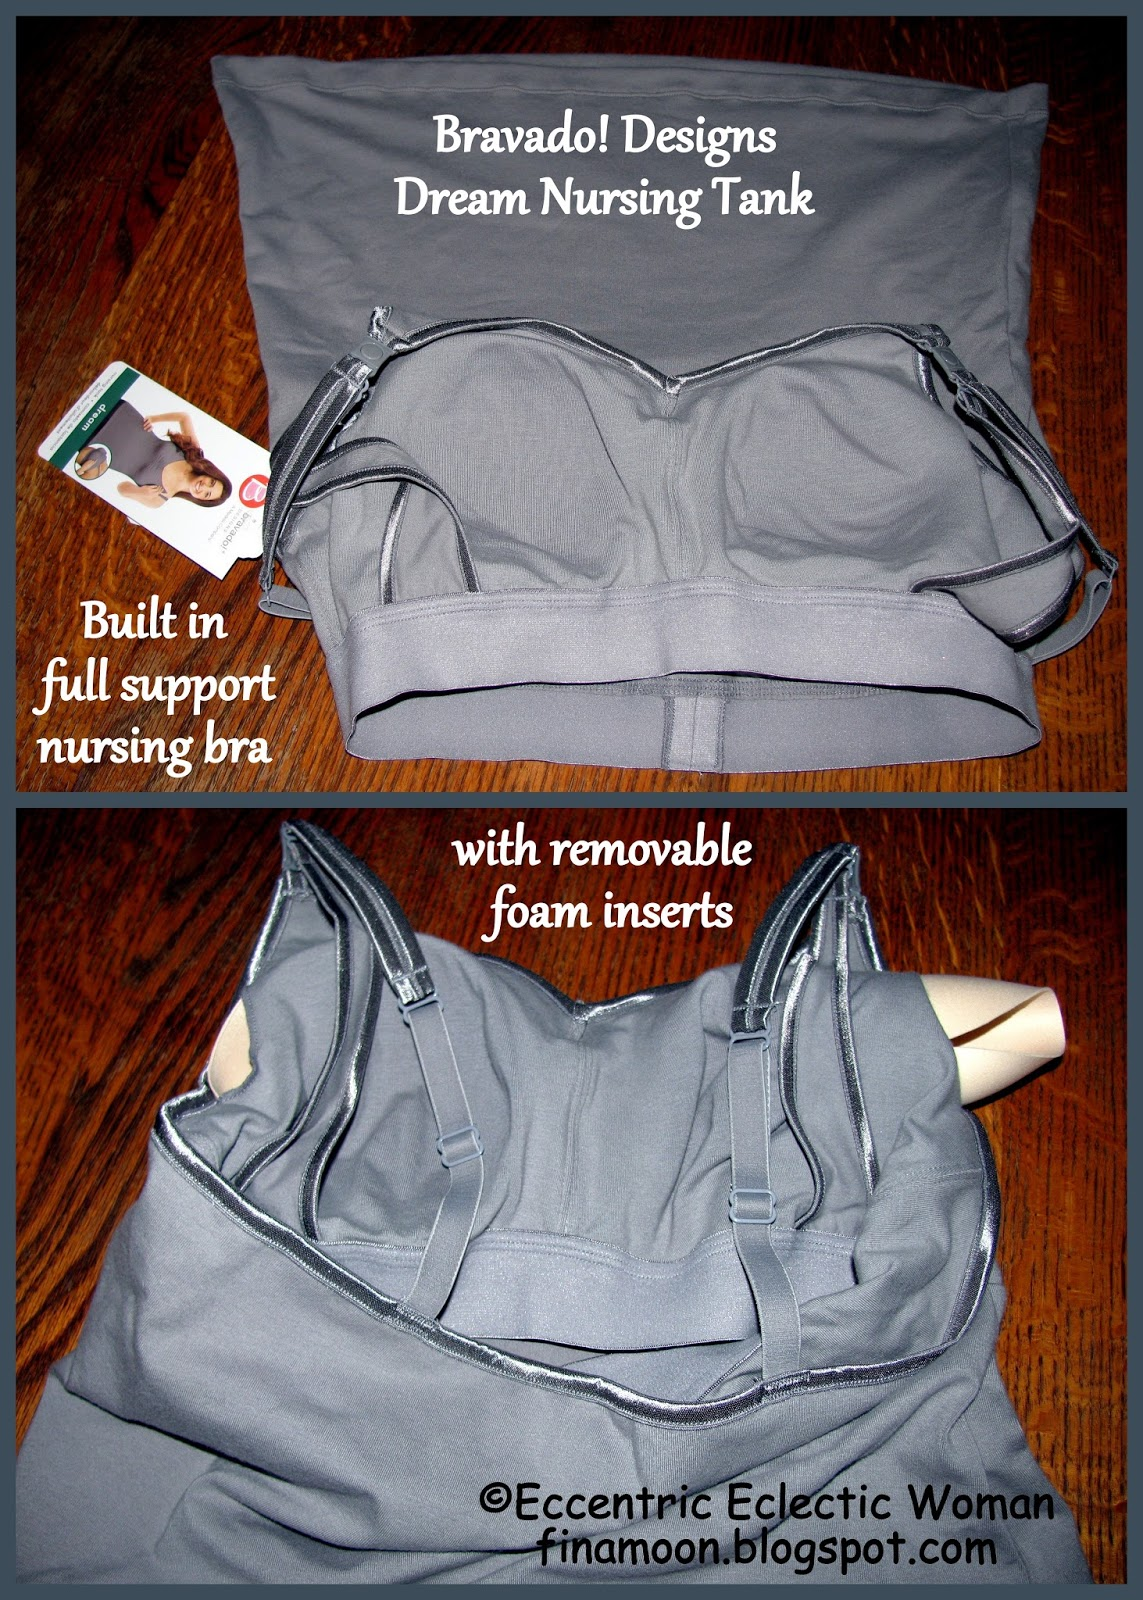 46accf0027 Bravado Dream Nursing Tank has a full support nursing bra with removable  foam inserts.